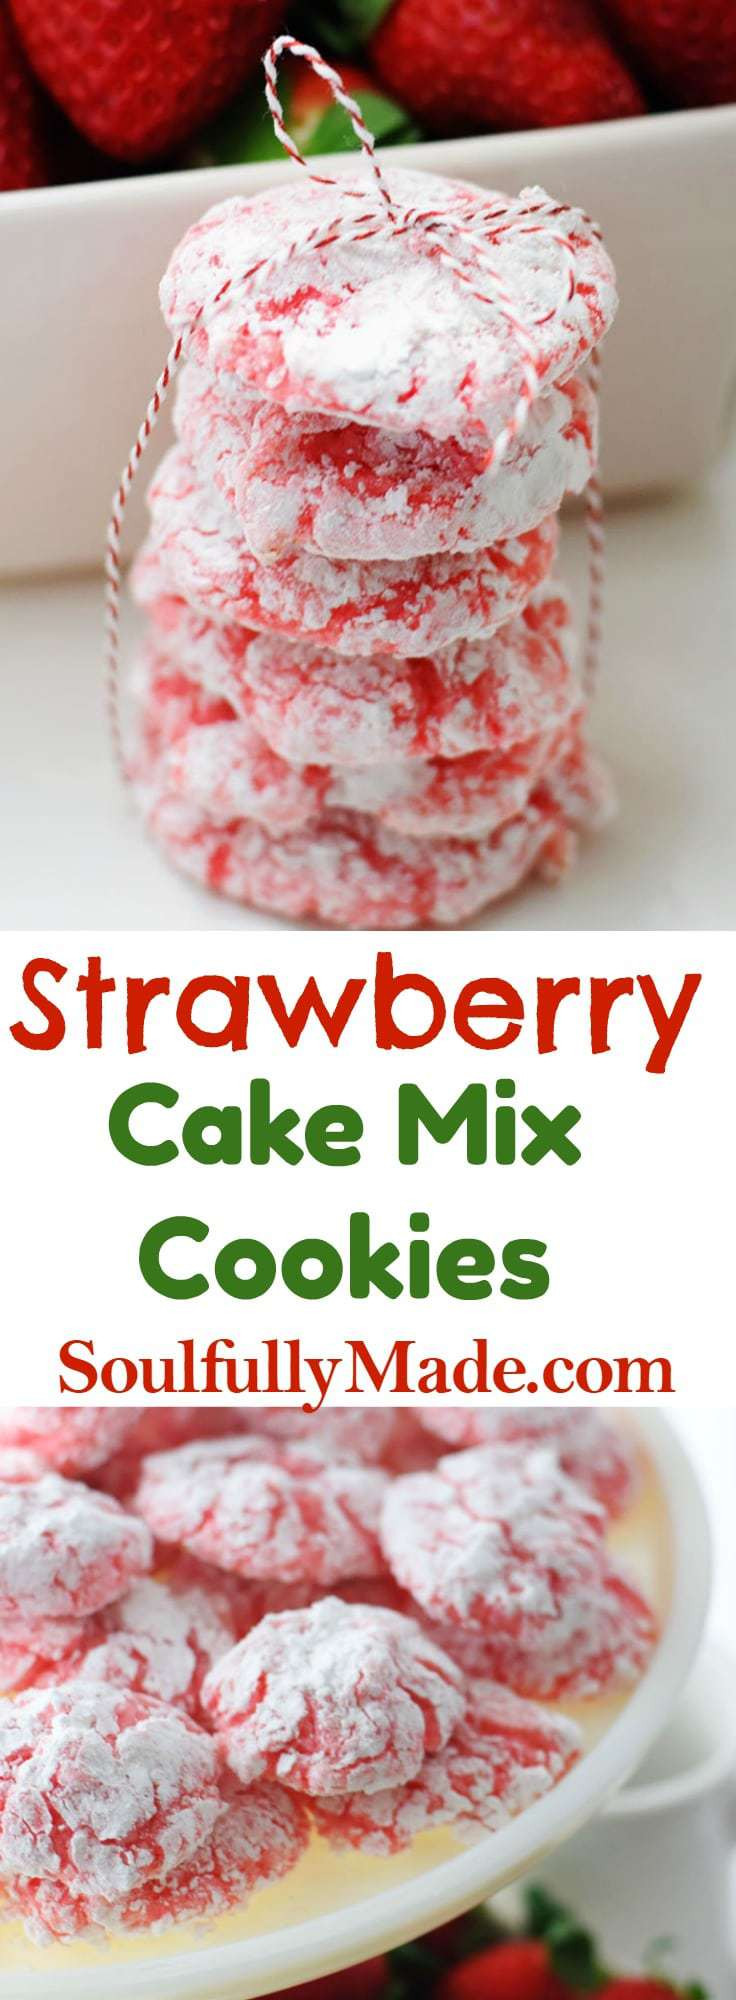 Strawberry Cake Mix  Strawberry Cake Mix Cookies Soulfully Made